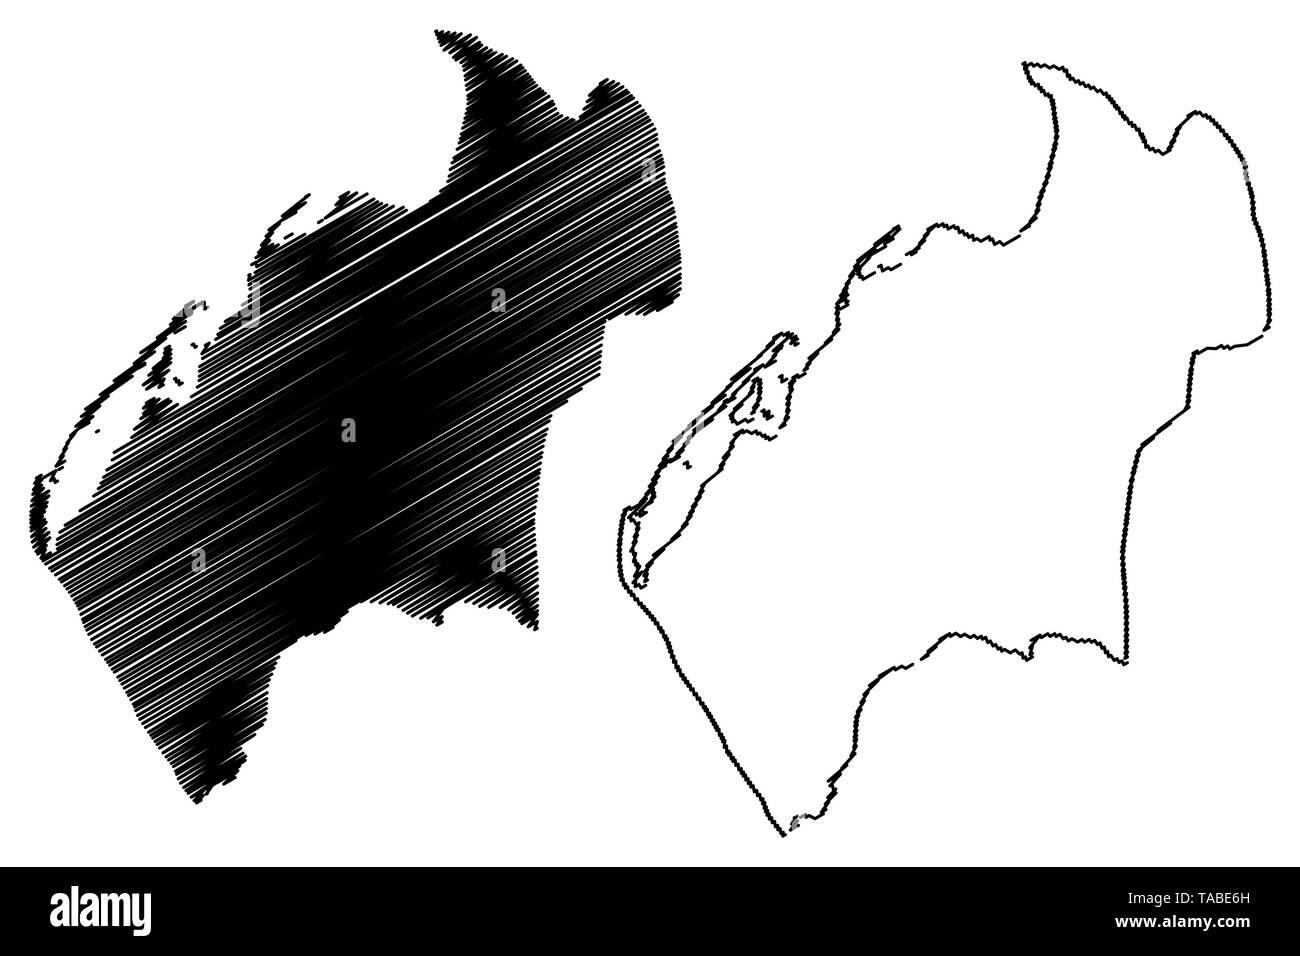 Luanda Province (Provinces of Angola, Republic of Angola) map vector illustration, scribble sketch Luanda map - Stock Vector